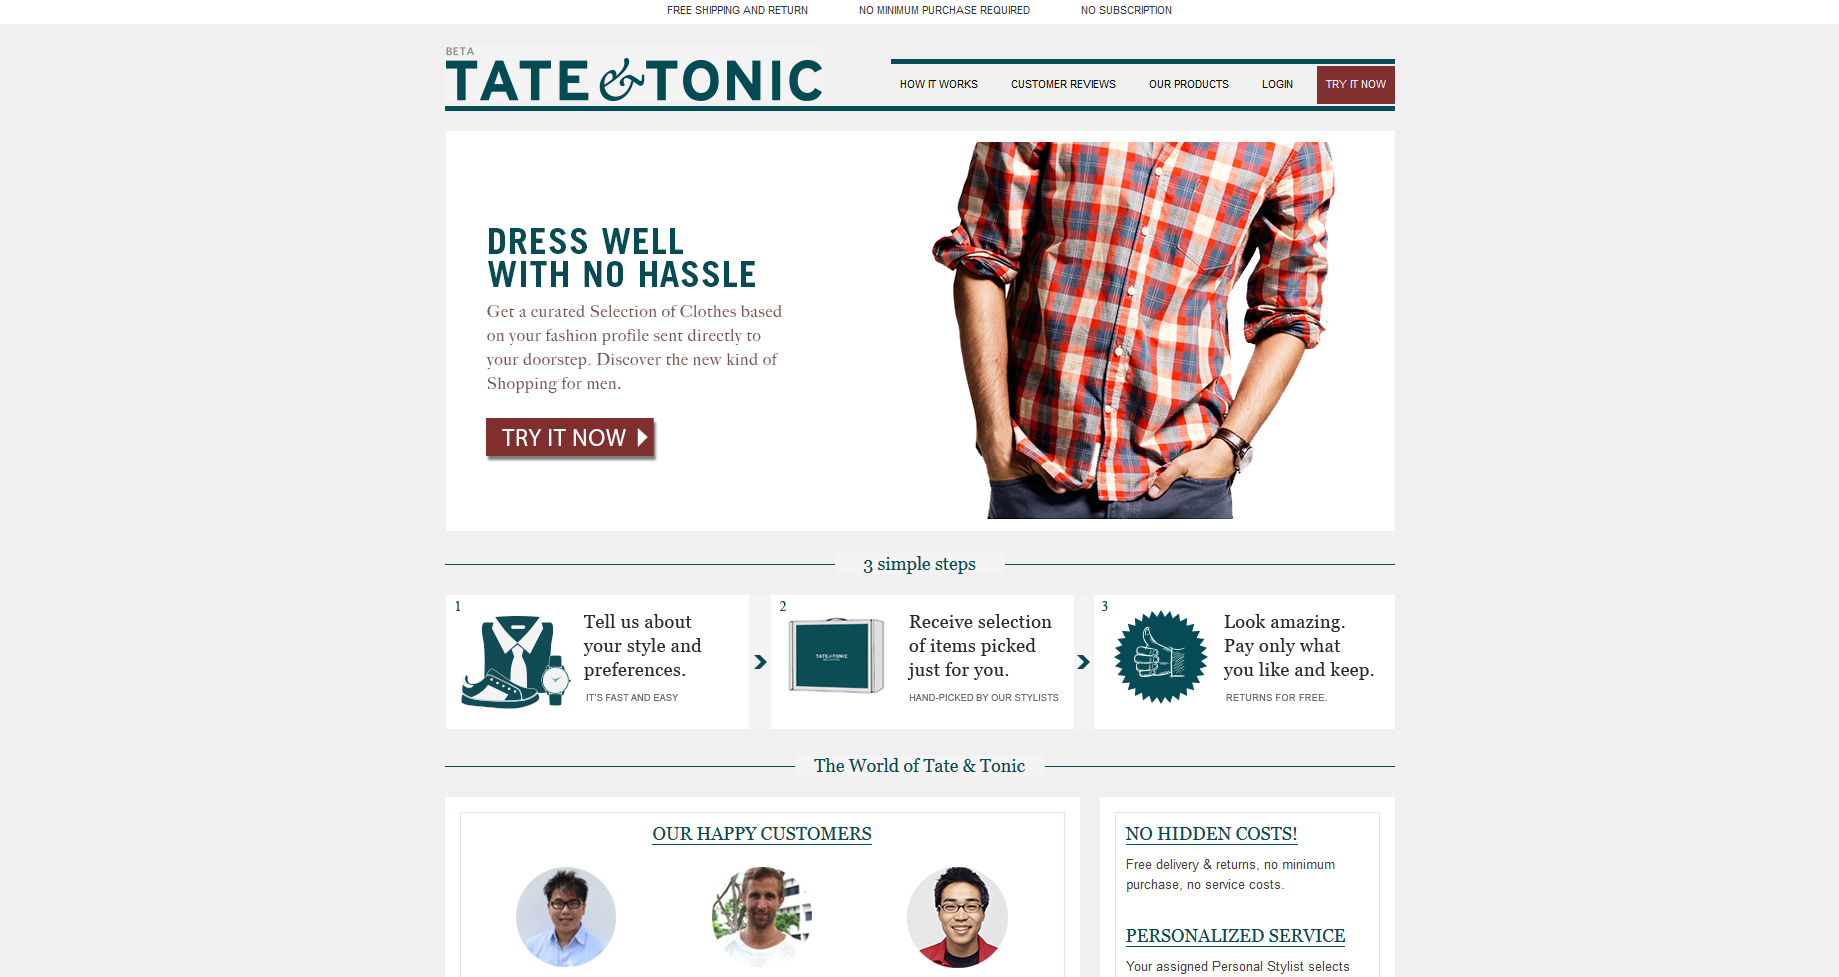 Tate & Tonic